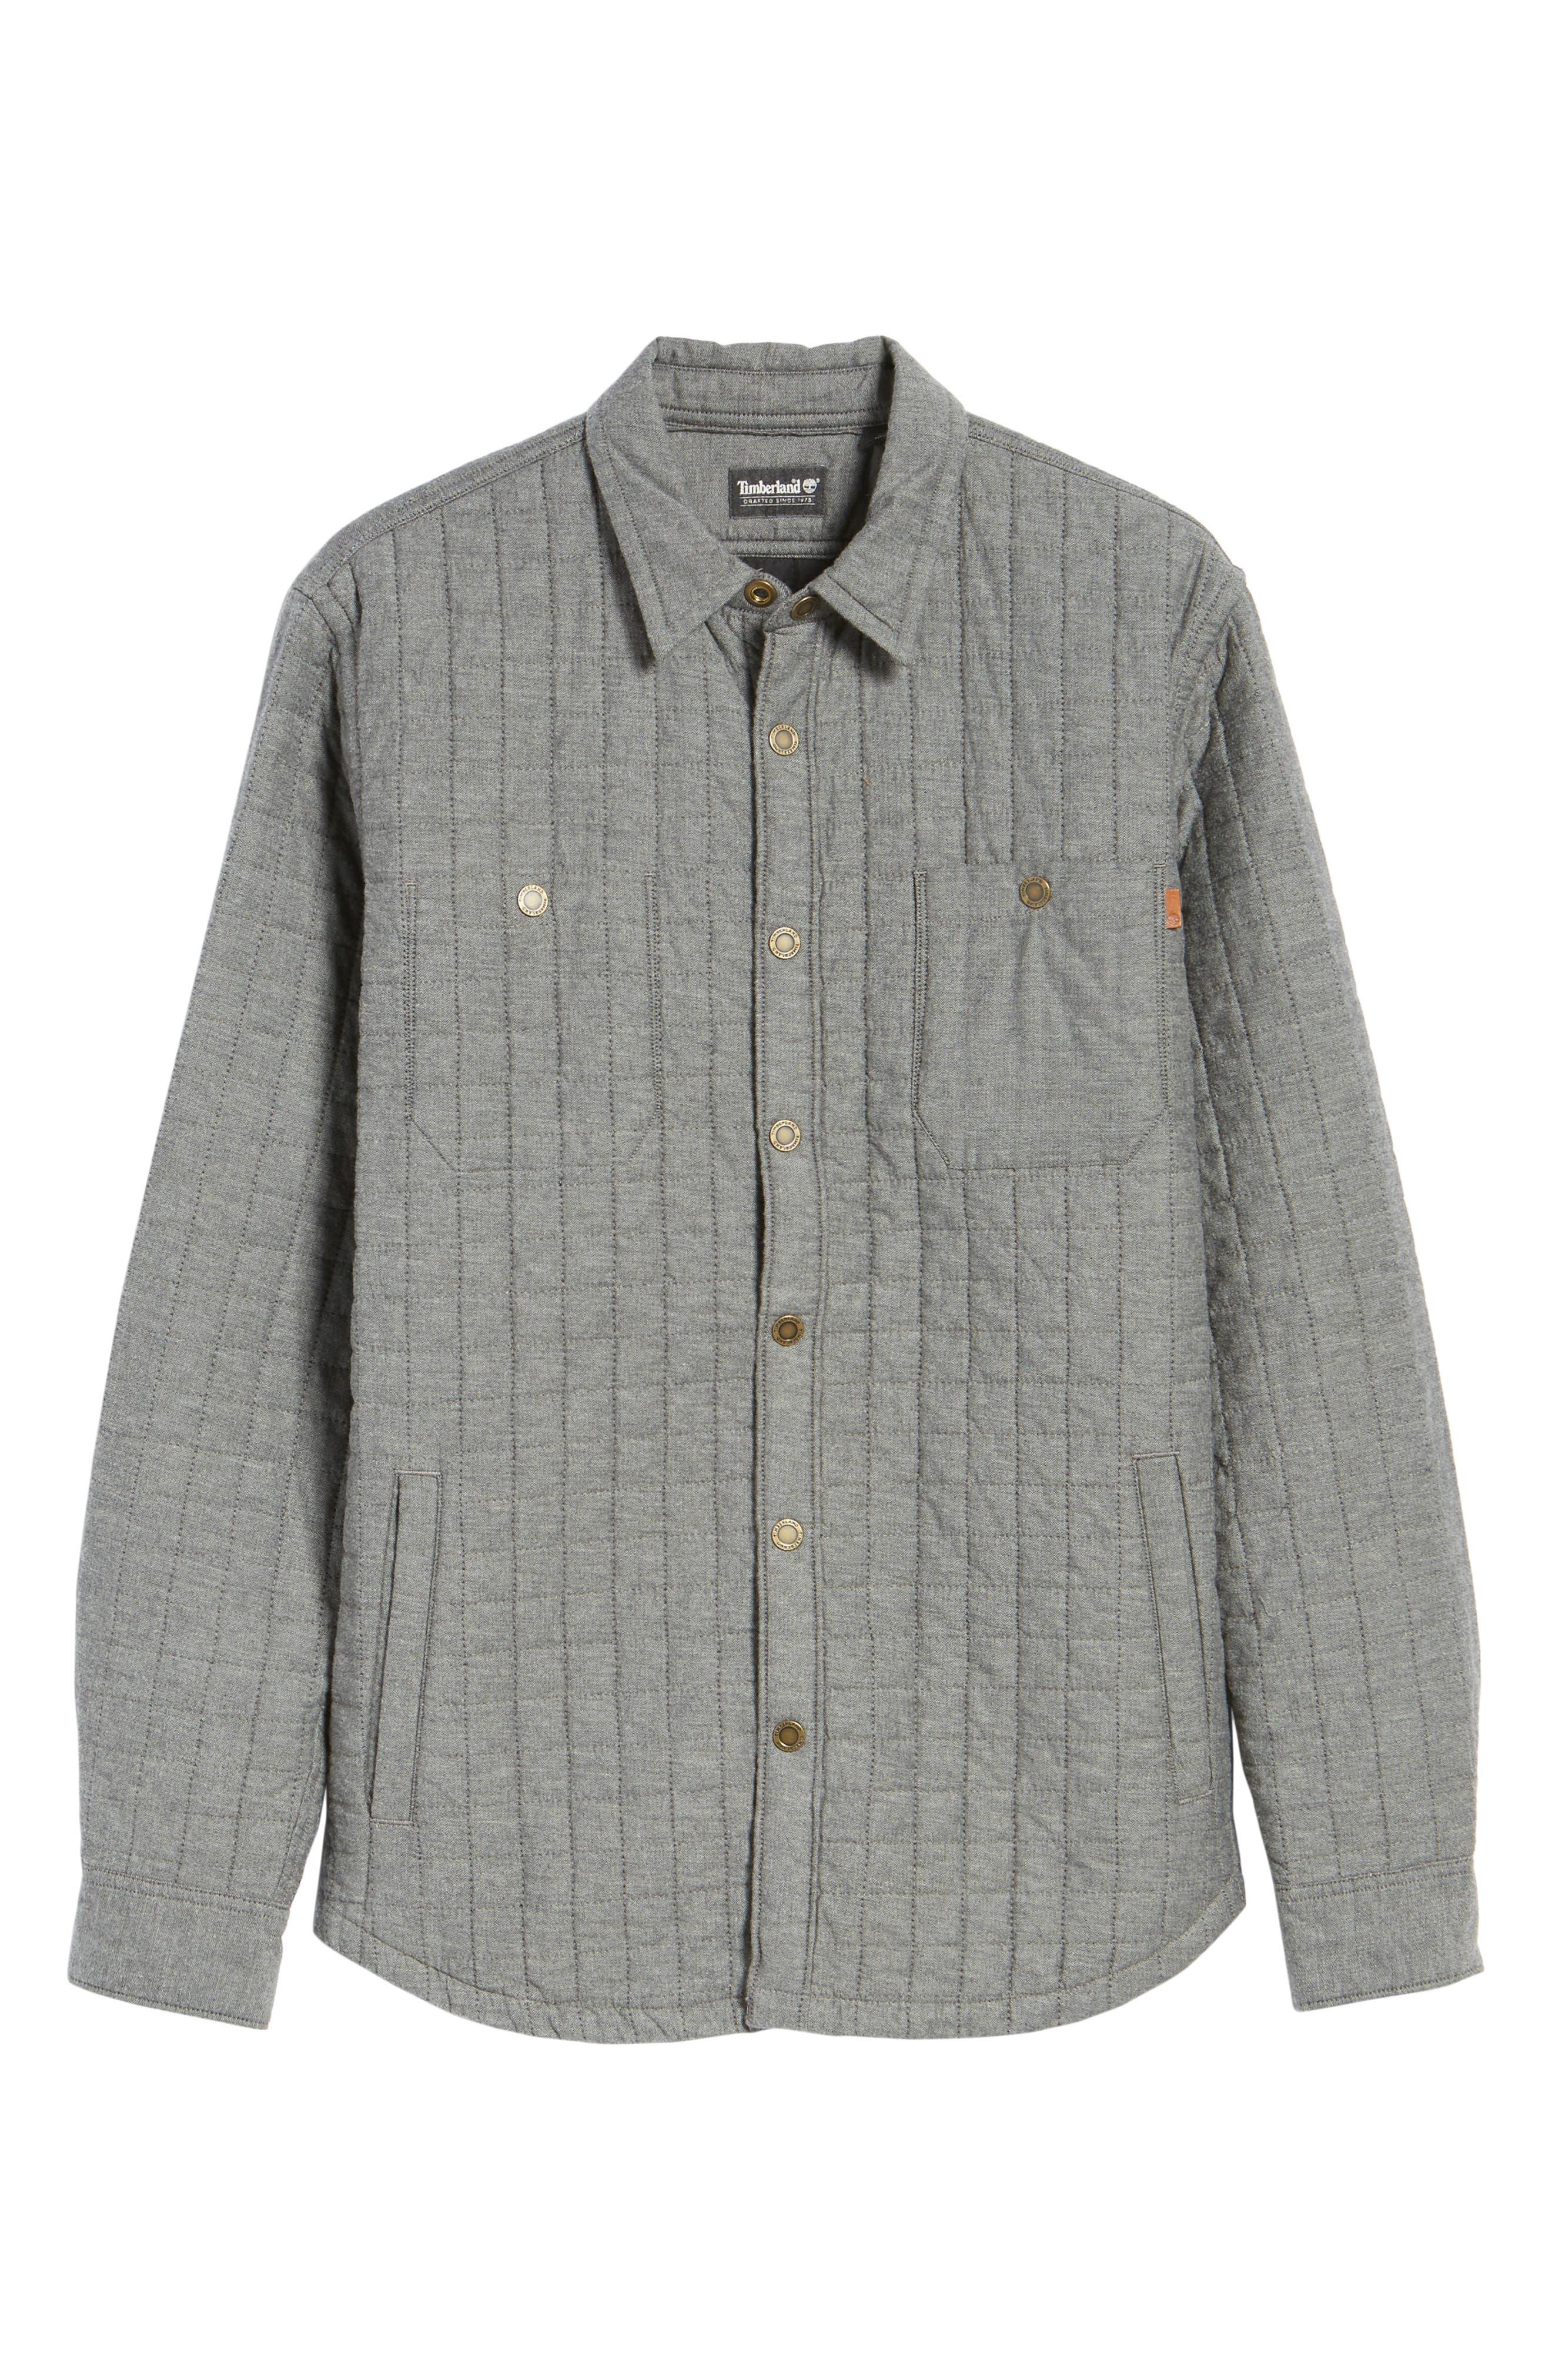 Gunstock River Lightweight Quilted Shirt Jacket,                             Alternate thumbnail 5, color,                             001